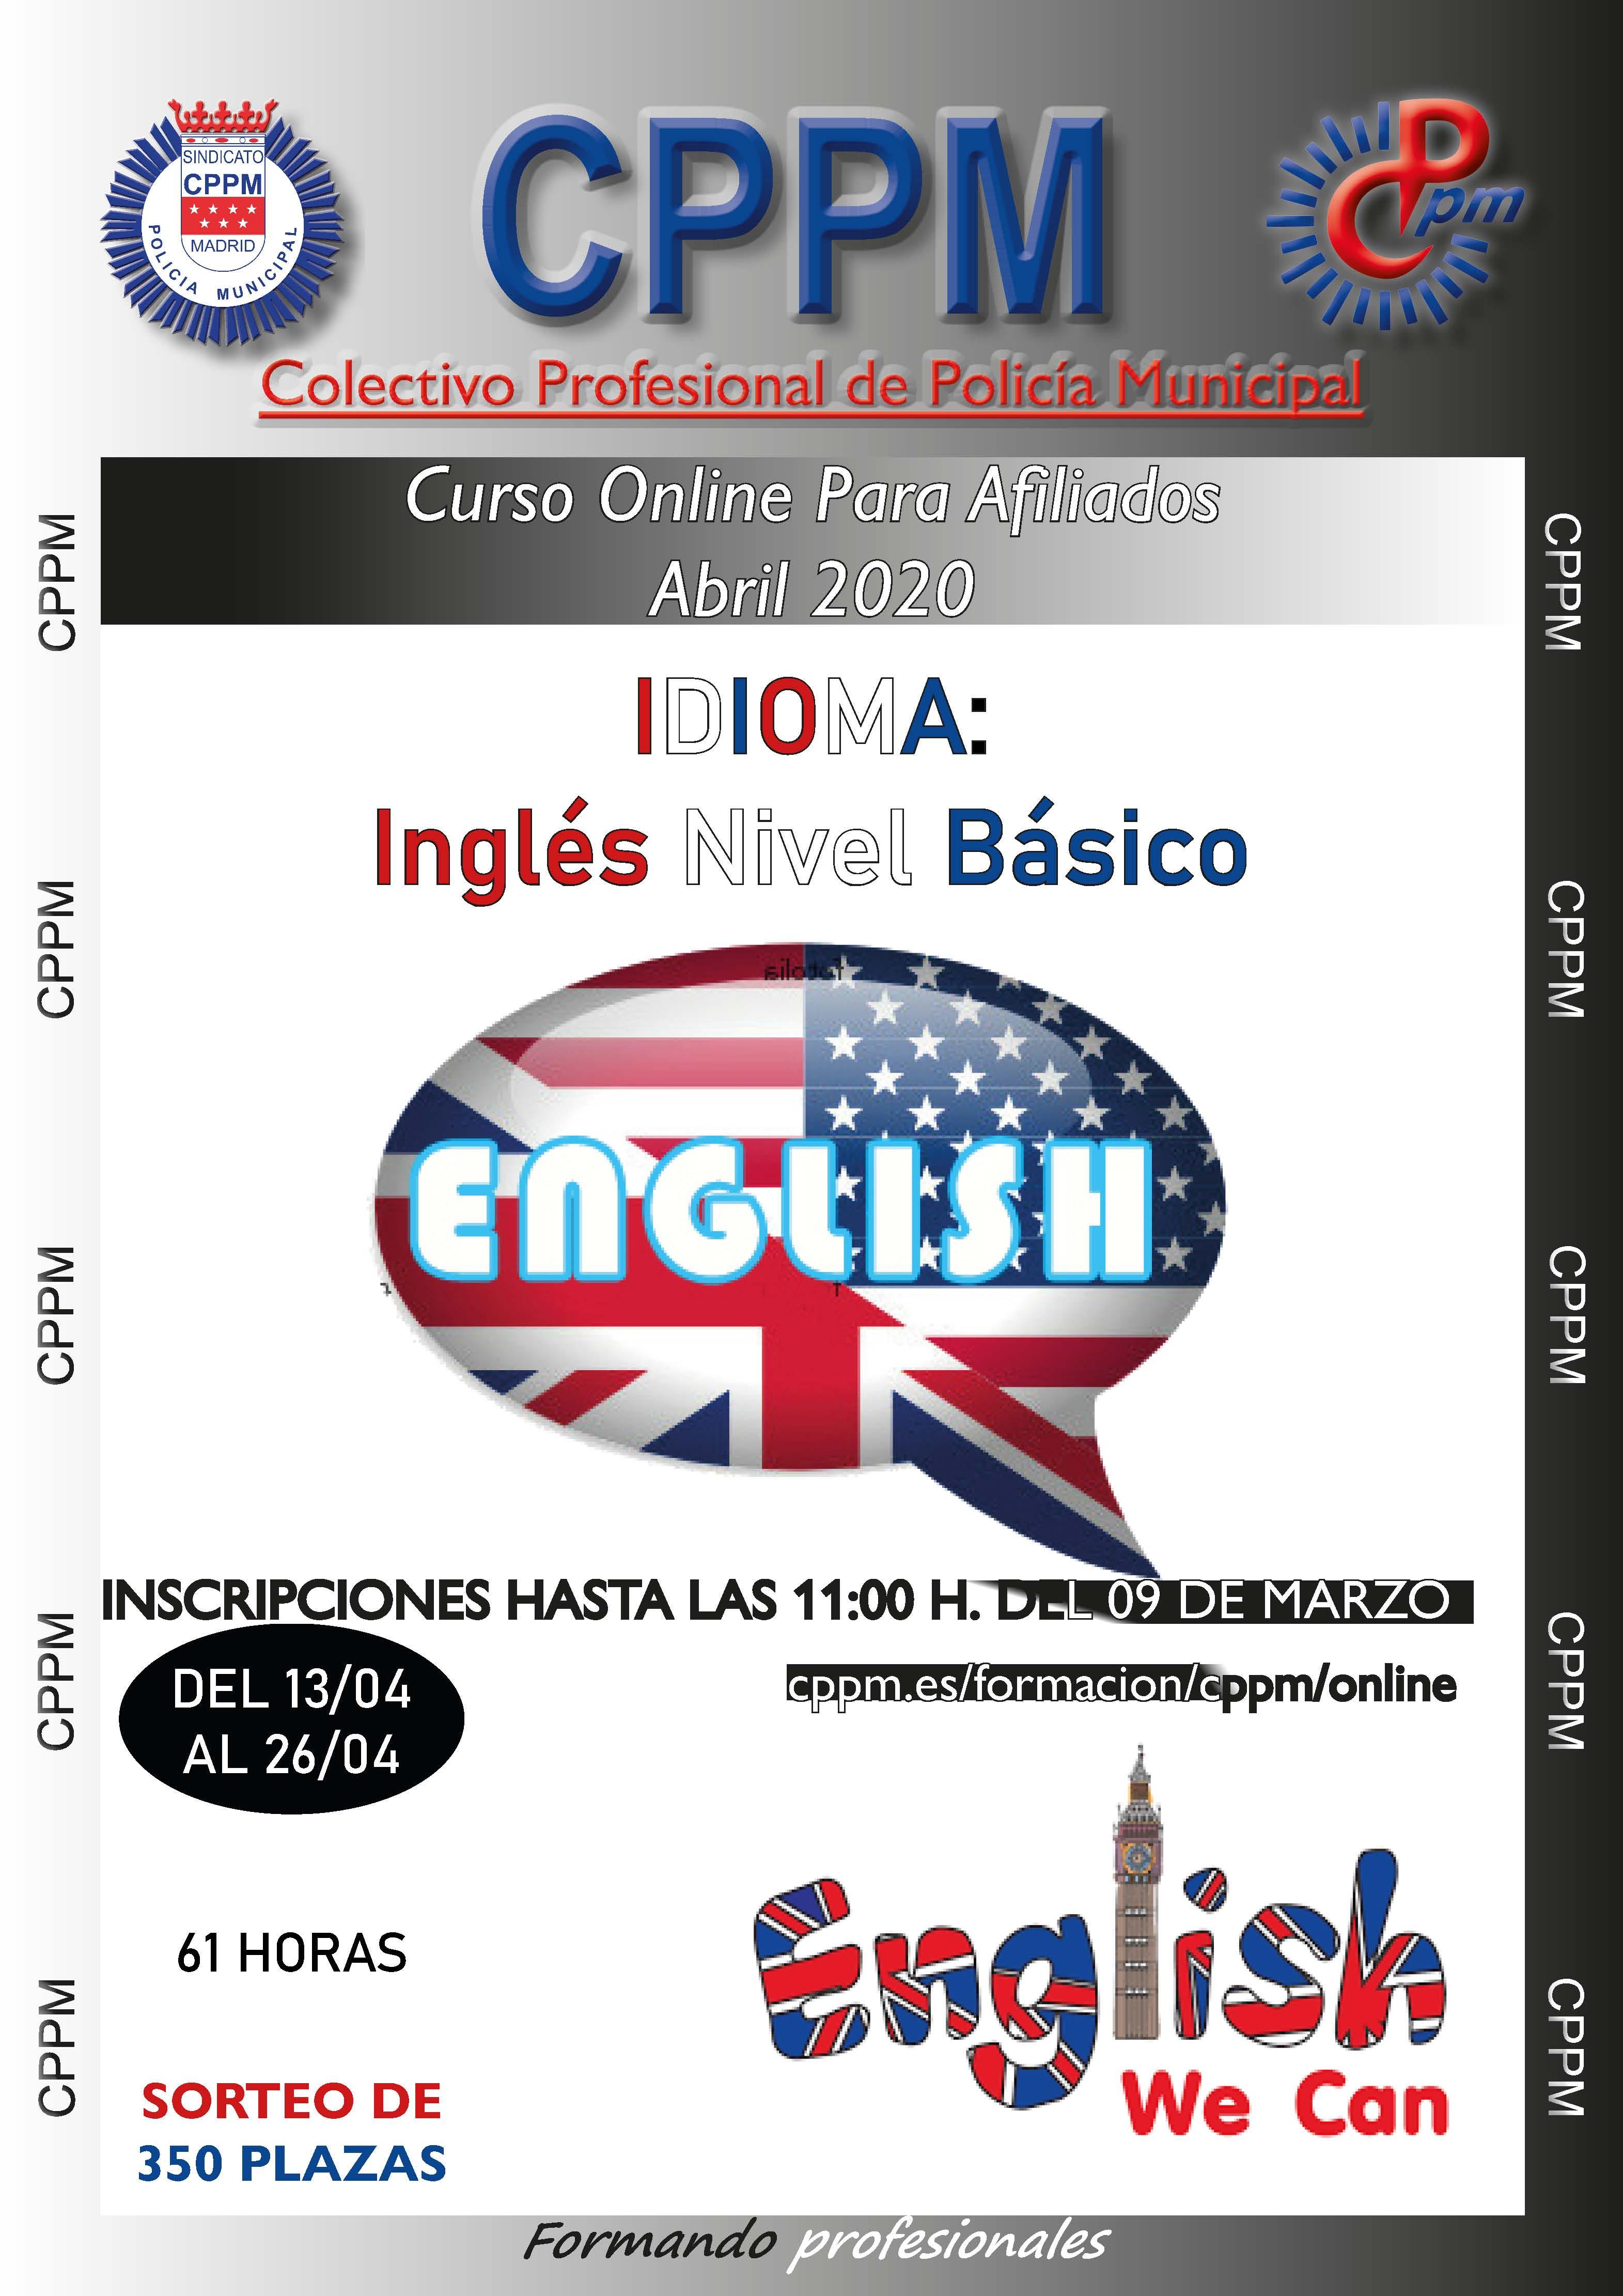 Inglés nivel básico Sindicato CPPM